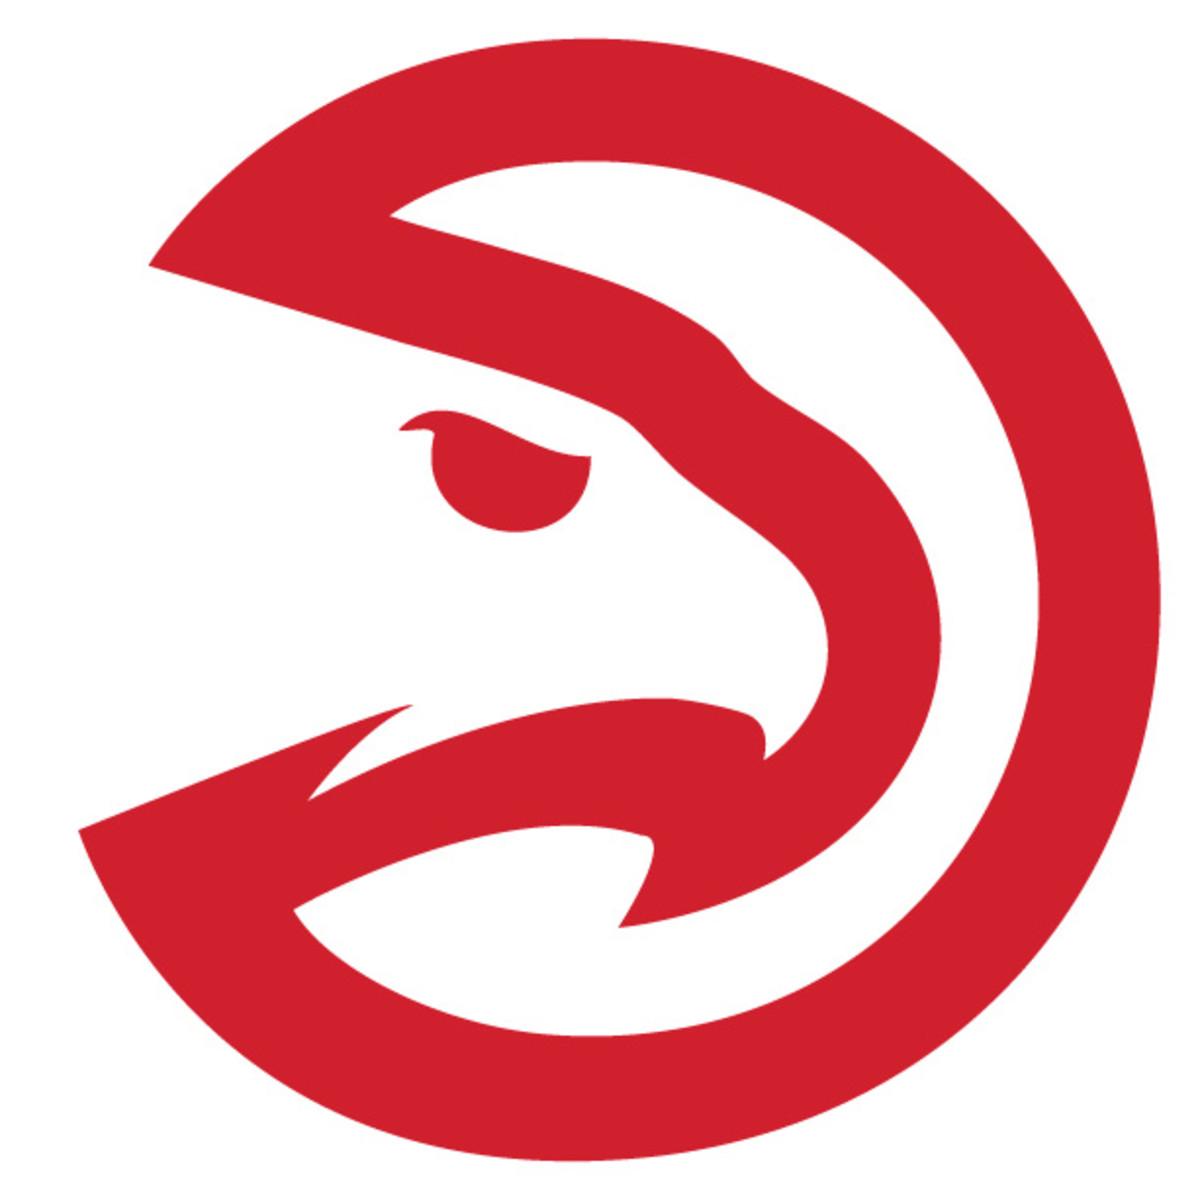 The Hawks' old logo (left) alongside their new secondary logo (right). (SportsLogos.Net)